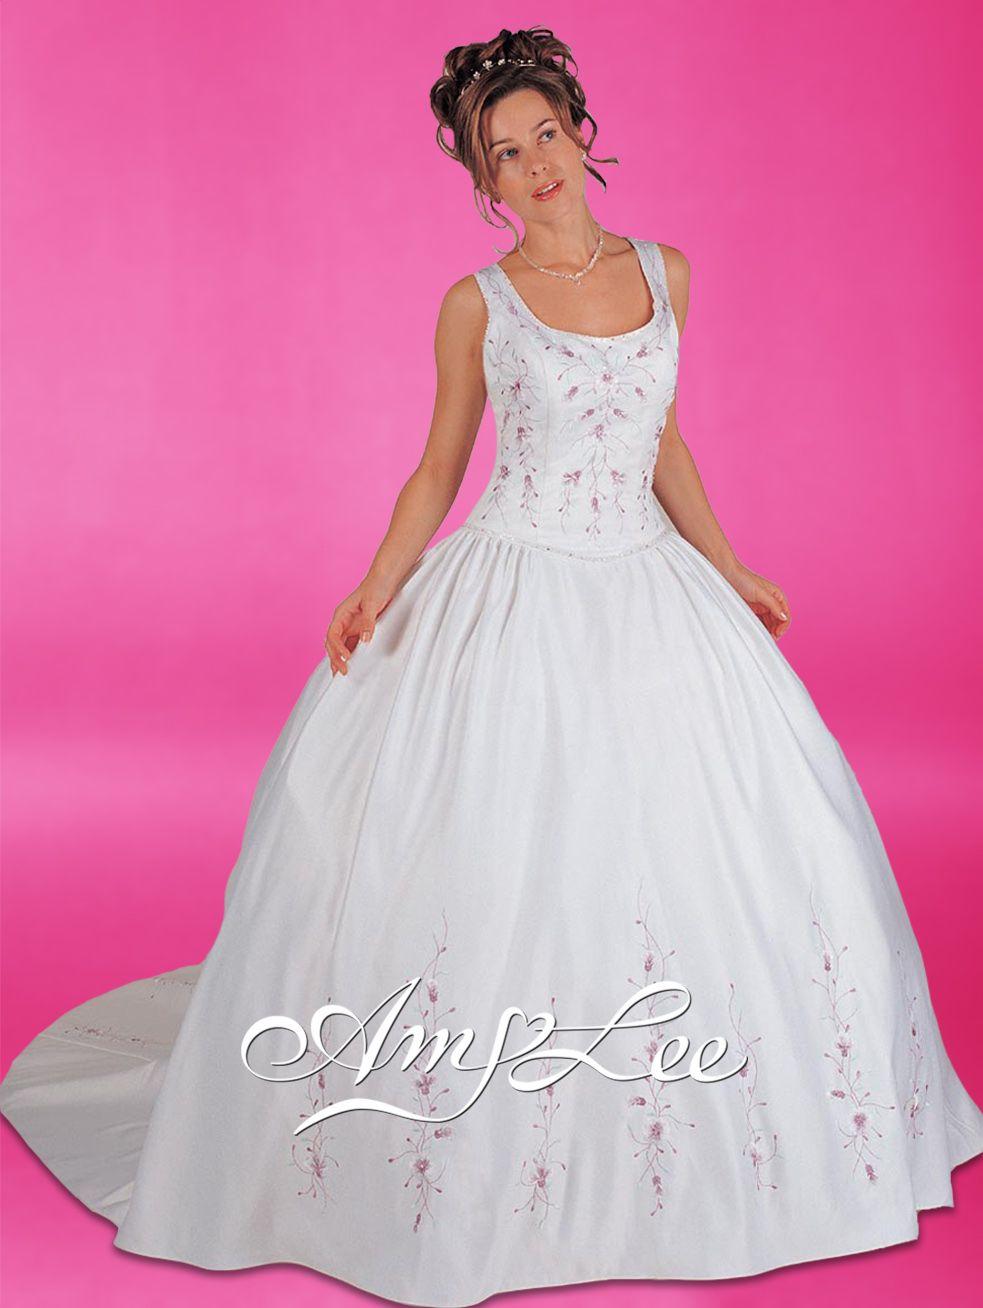 Disney Princess Wedding Dress Disney Princess Wedding Dresses Disney Princess Wedding Wedding Dresses [ 1308 x 983 Pixel ]